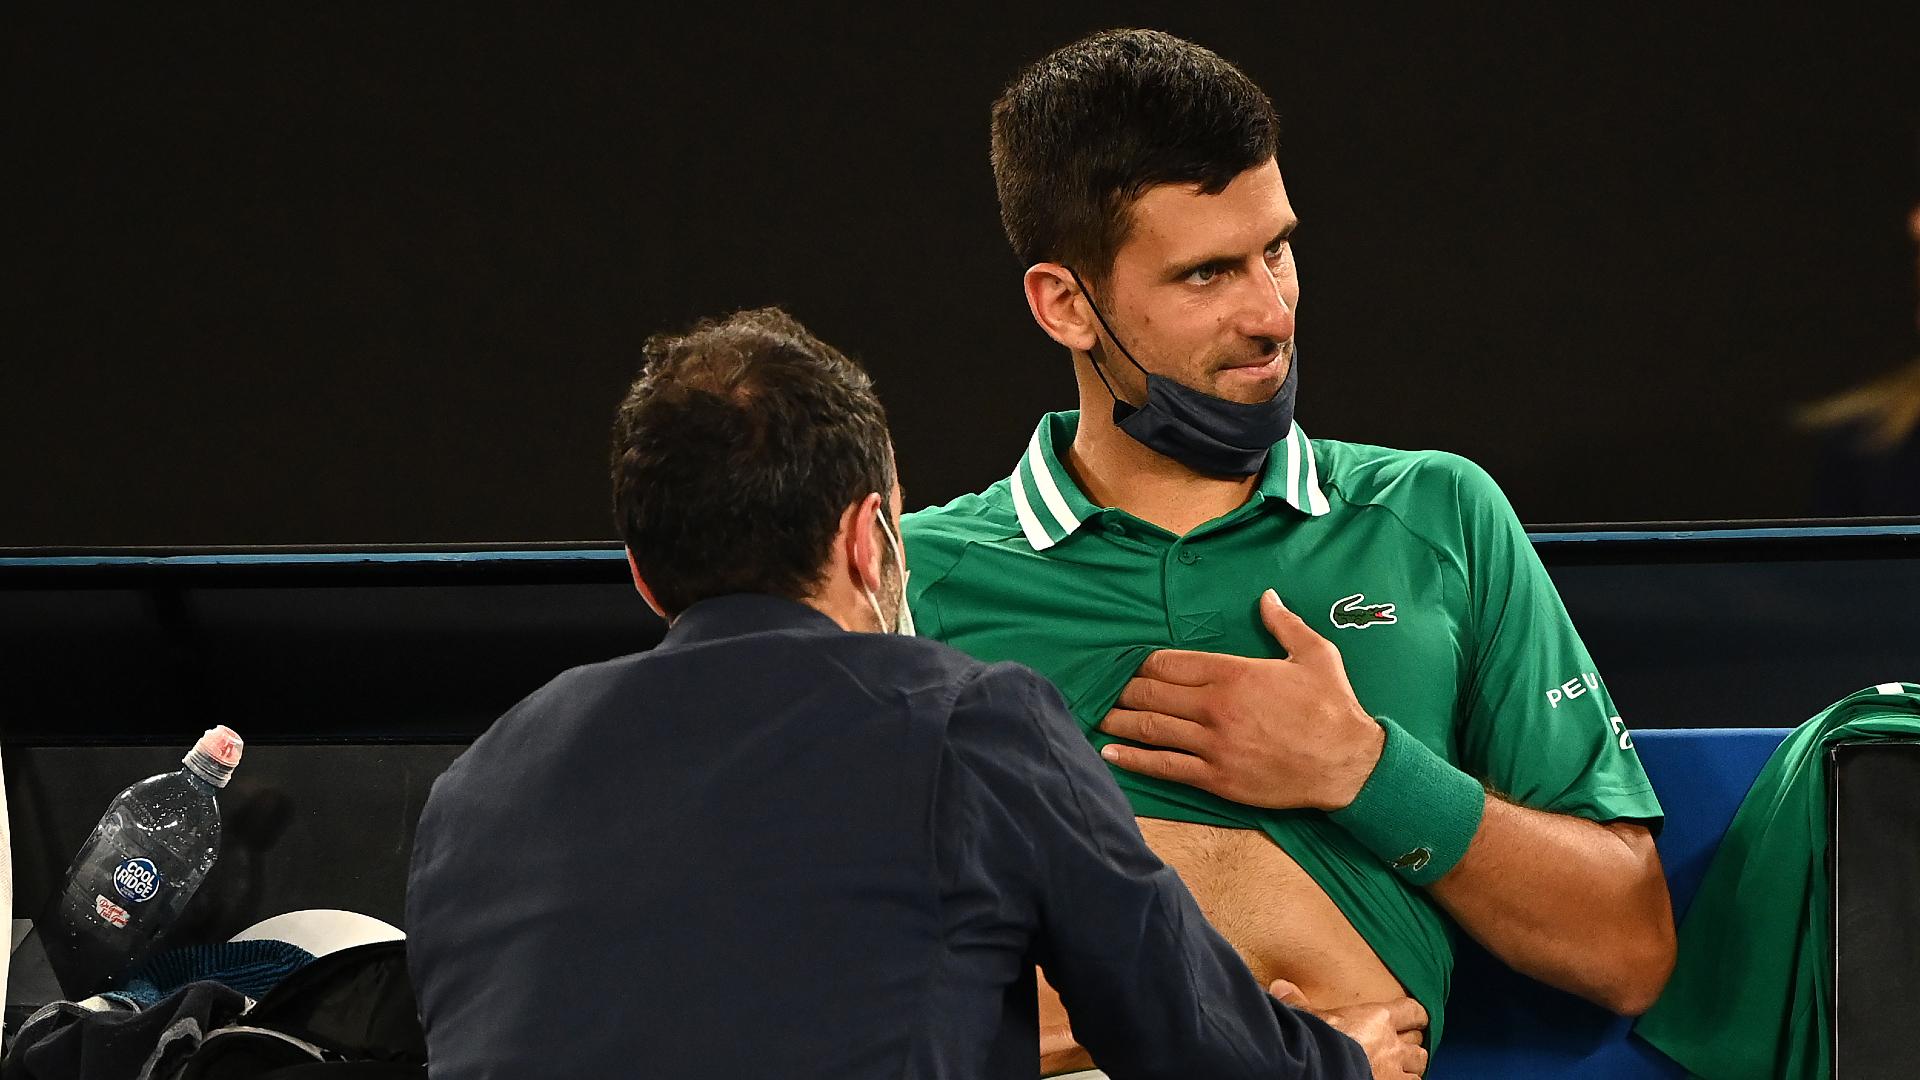 Australian Open: Djokovic cancels practice plan as title defence hangs in the balance